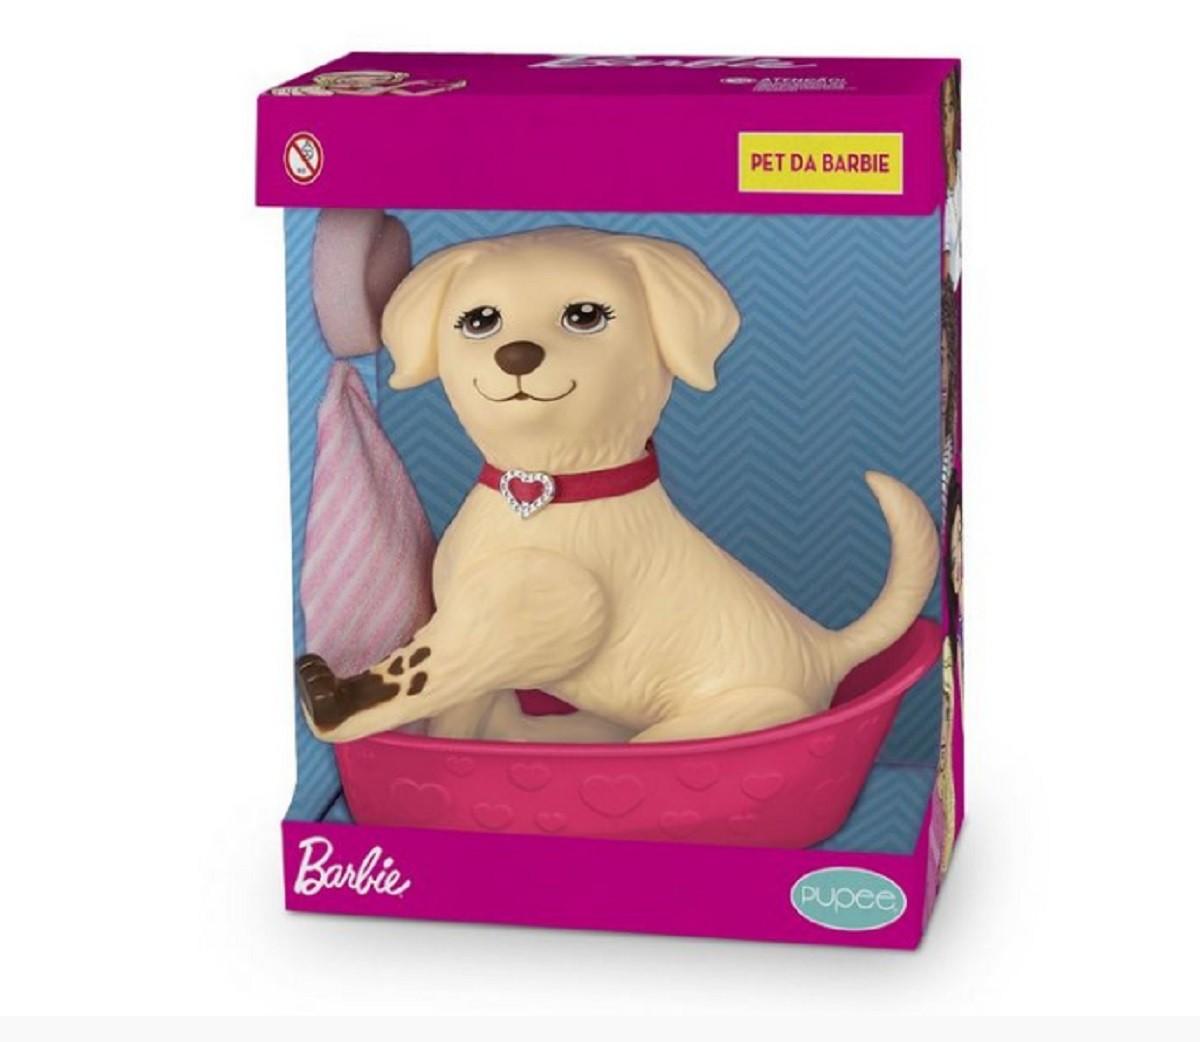 Pet Shop da Barbie Honey Cachorro 22cm Pupee 1257